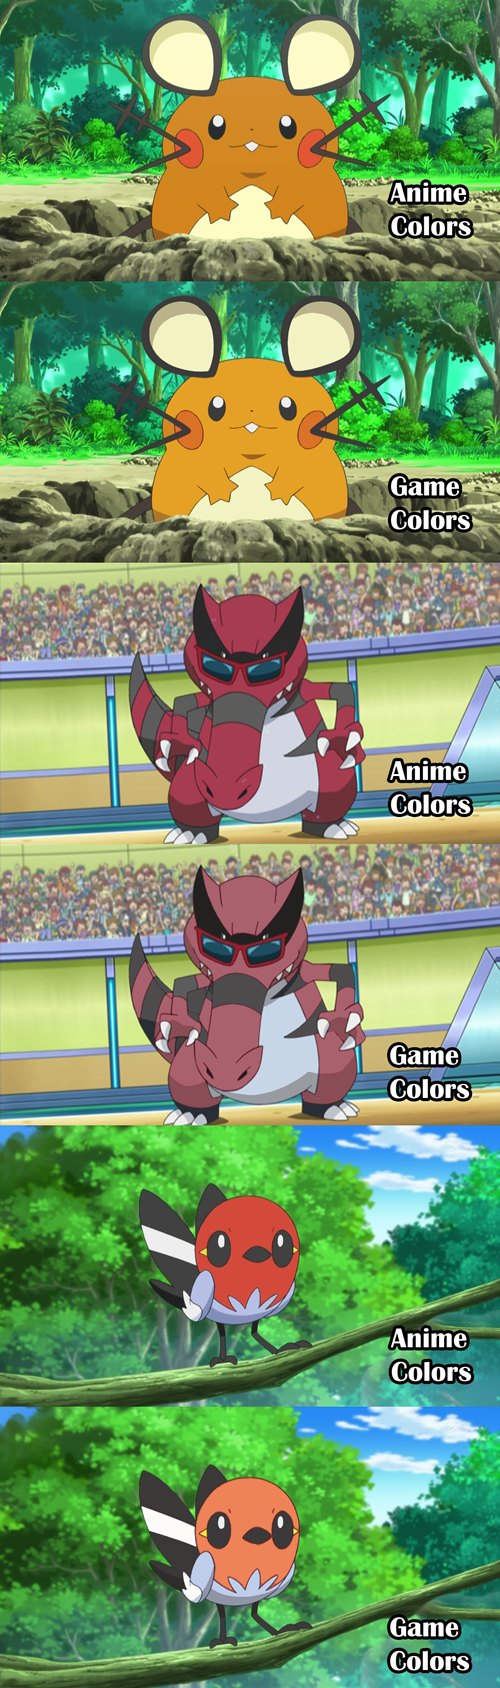 Pokémon colors anime - 8088105472